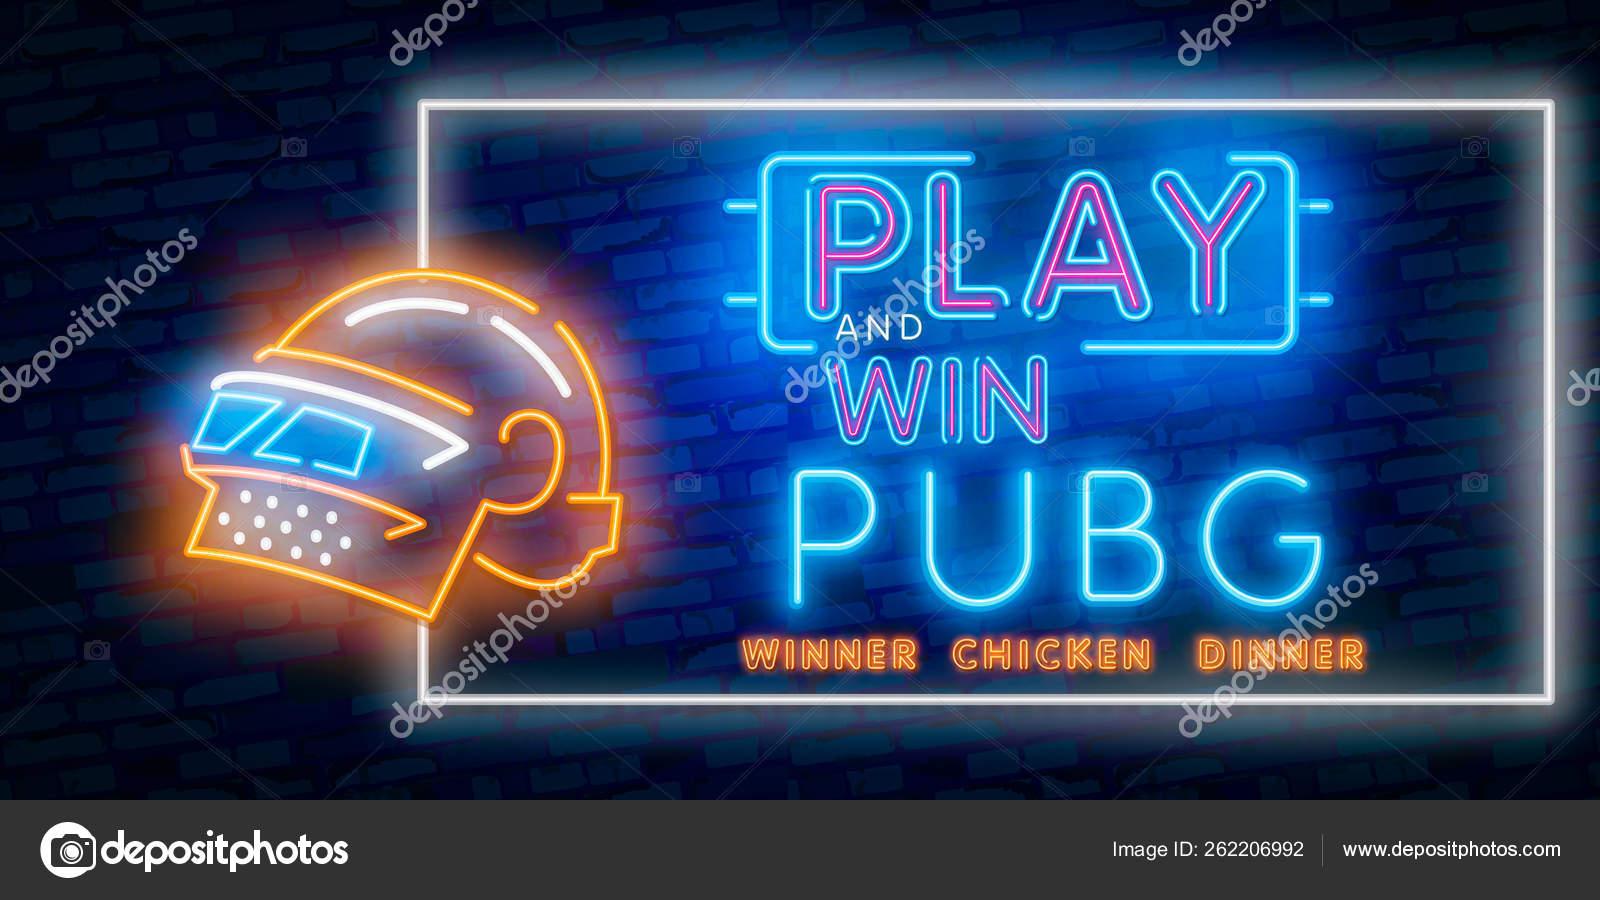 Winner Winner Chicken Dinner Pubg Wallpaper Download Pubg